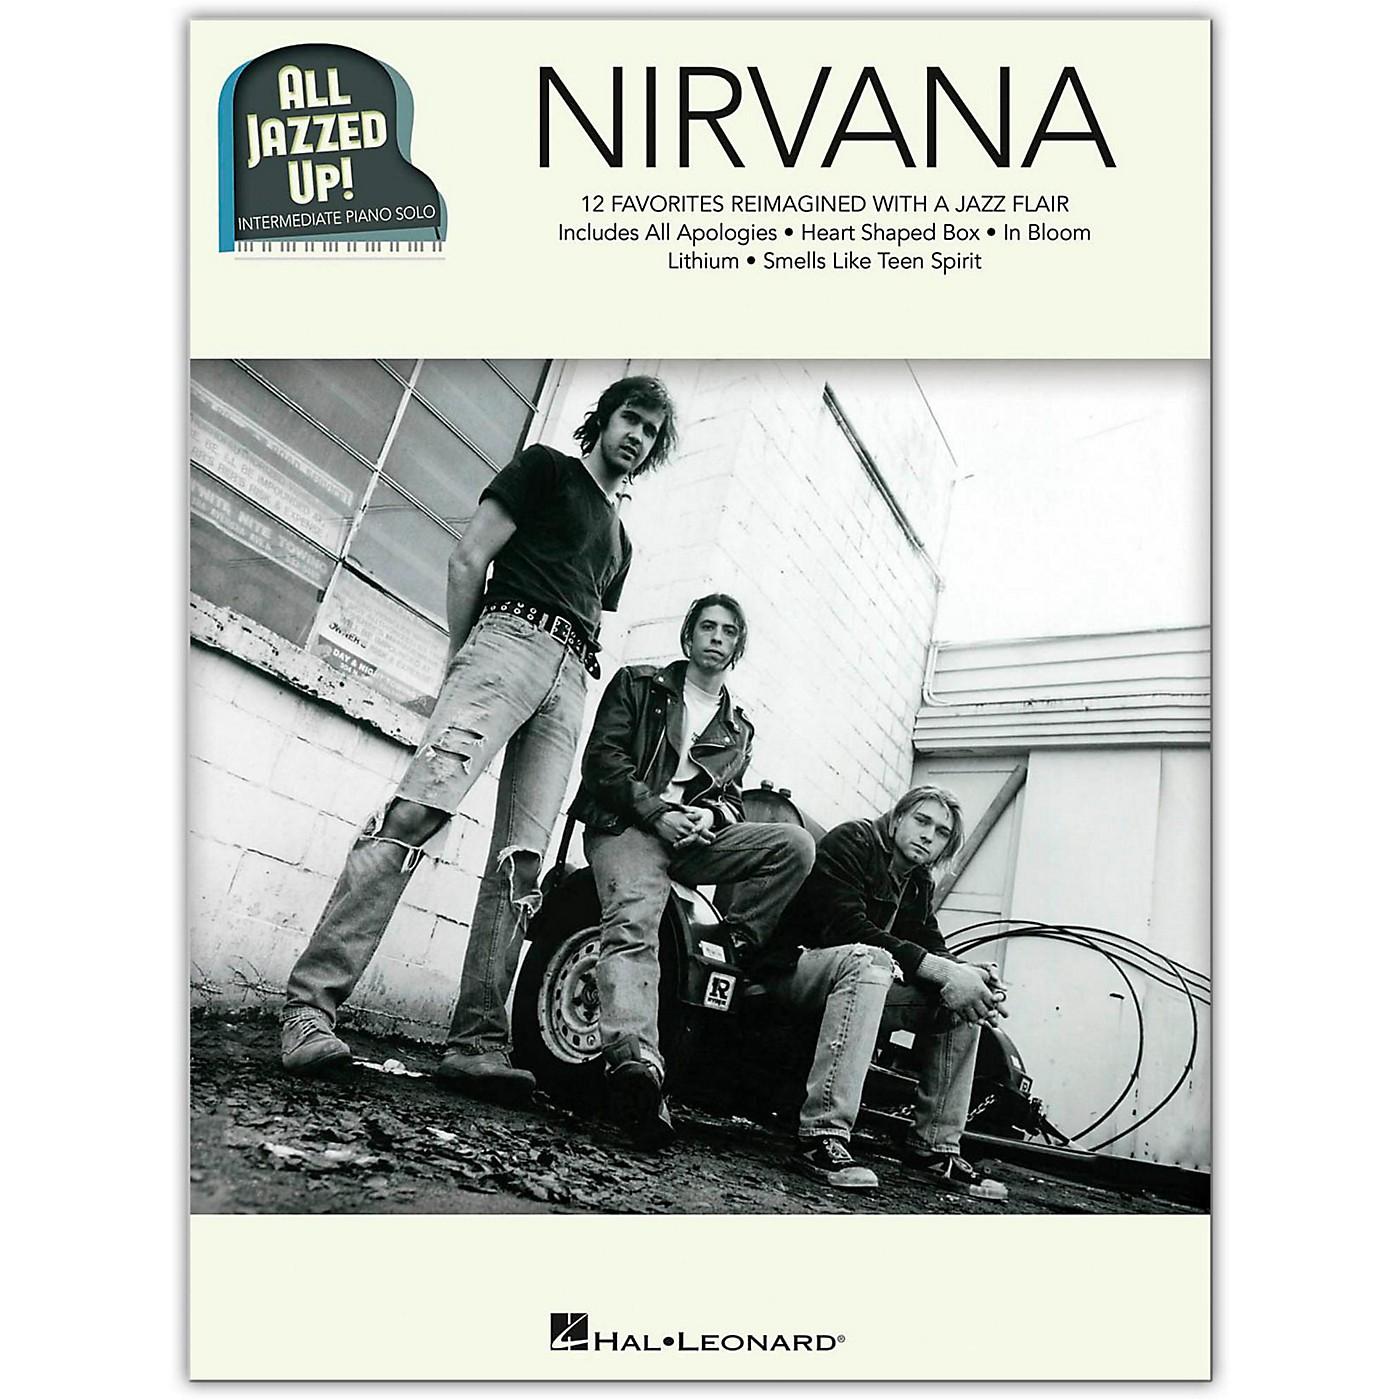 Hal Leonard Nirvana - All Jazzed Up!  Intermediate Piano Solo Songbook thumbnail